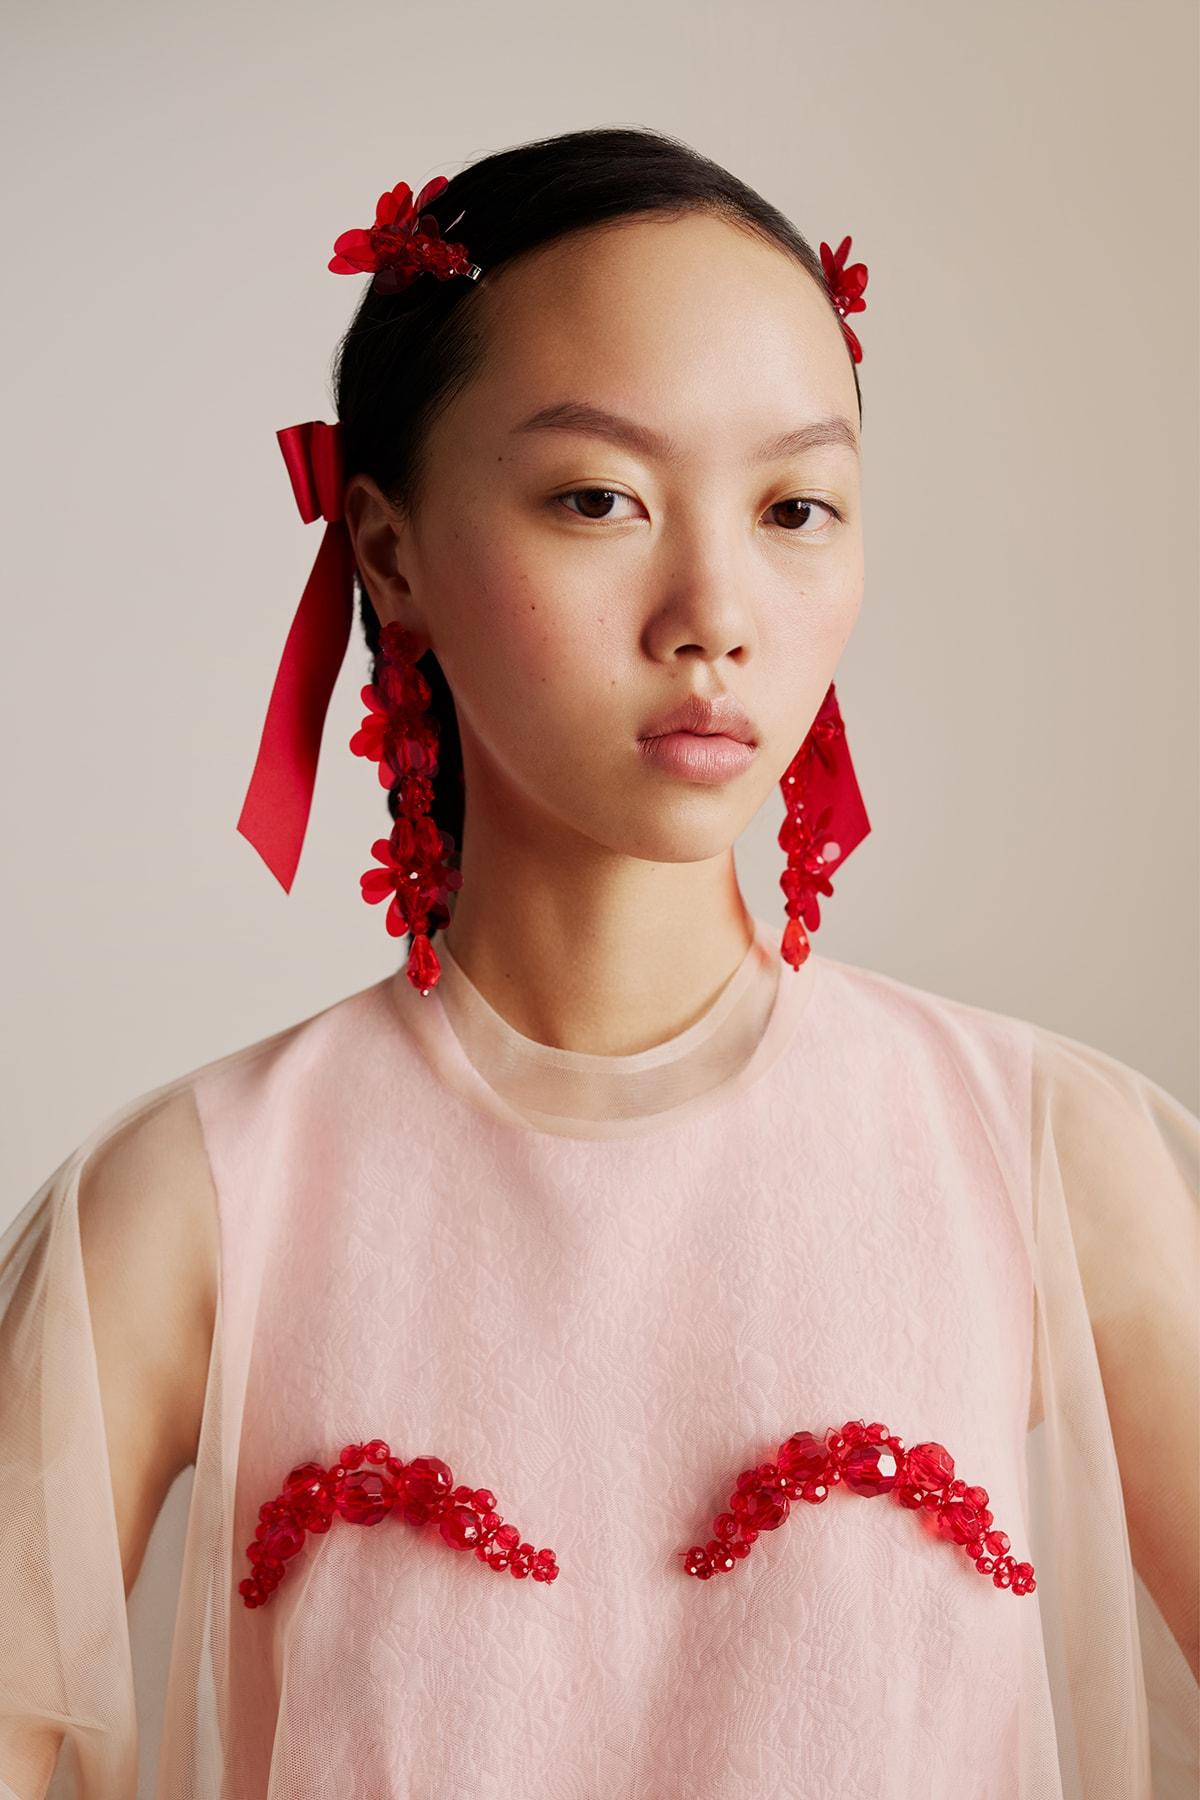 Simone Rocha x H&M Collaboration Campaign Daisy Edgar-Jones